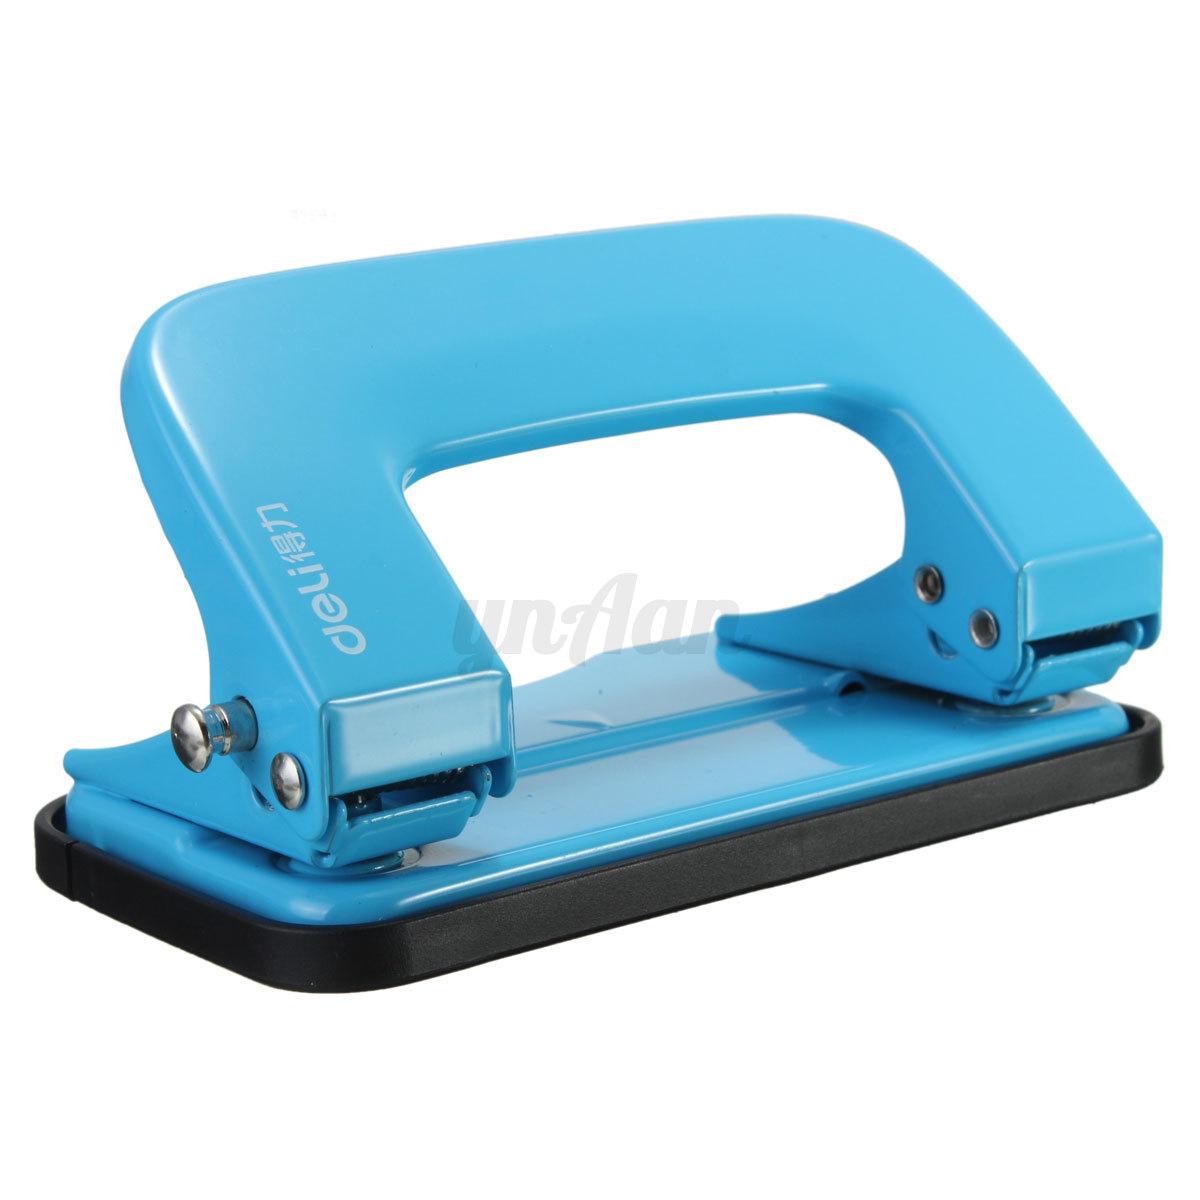 Deli Metal 2 Hole Desk Paper Punch File Perforator Home